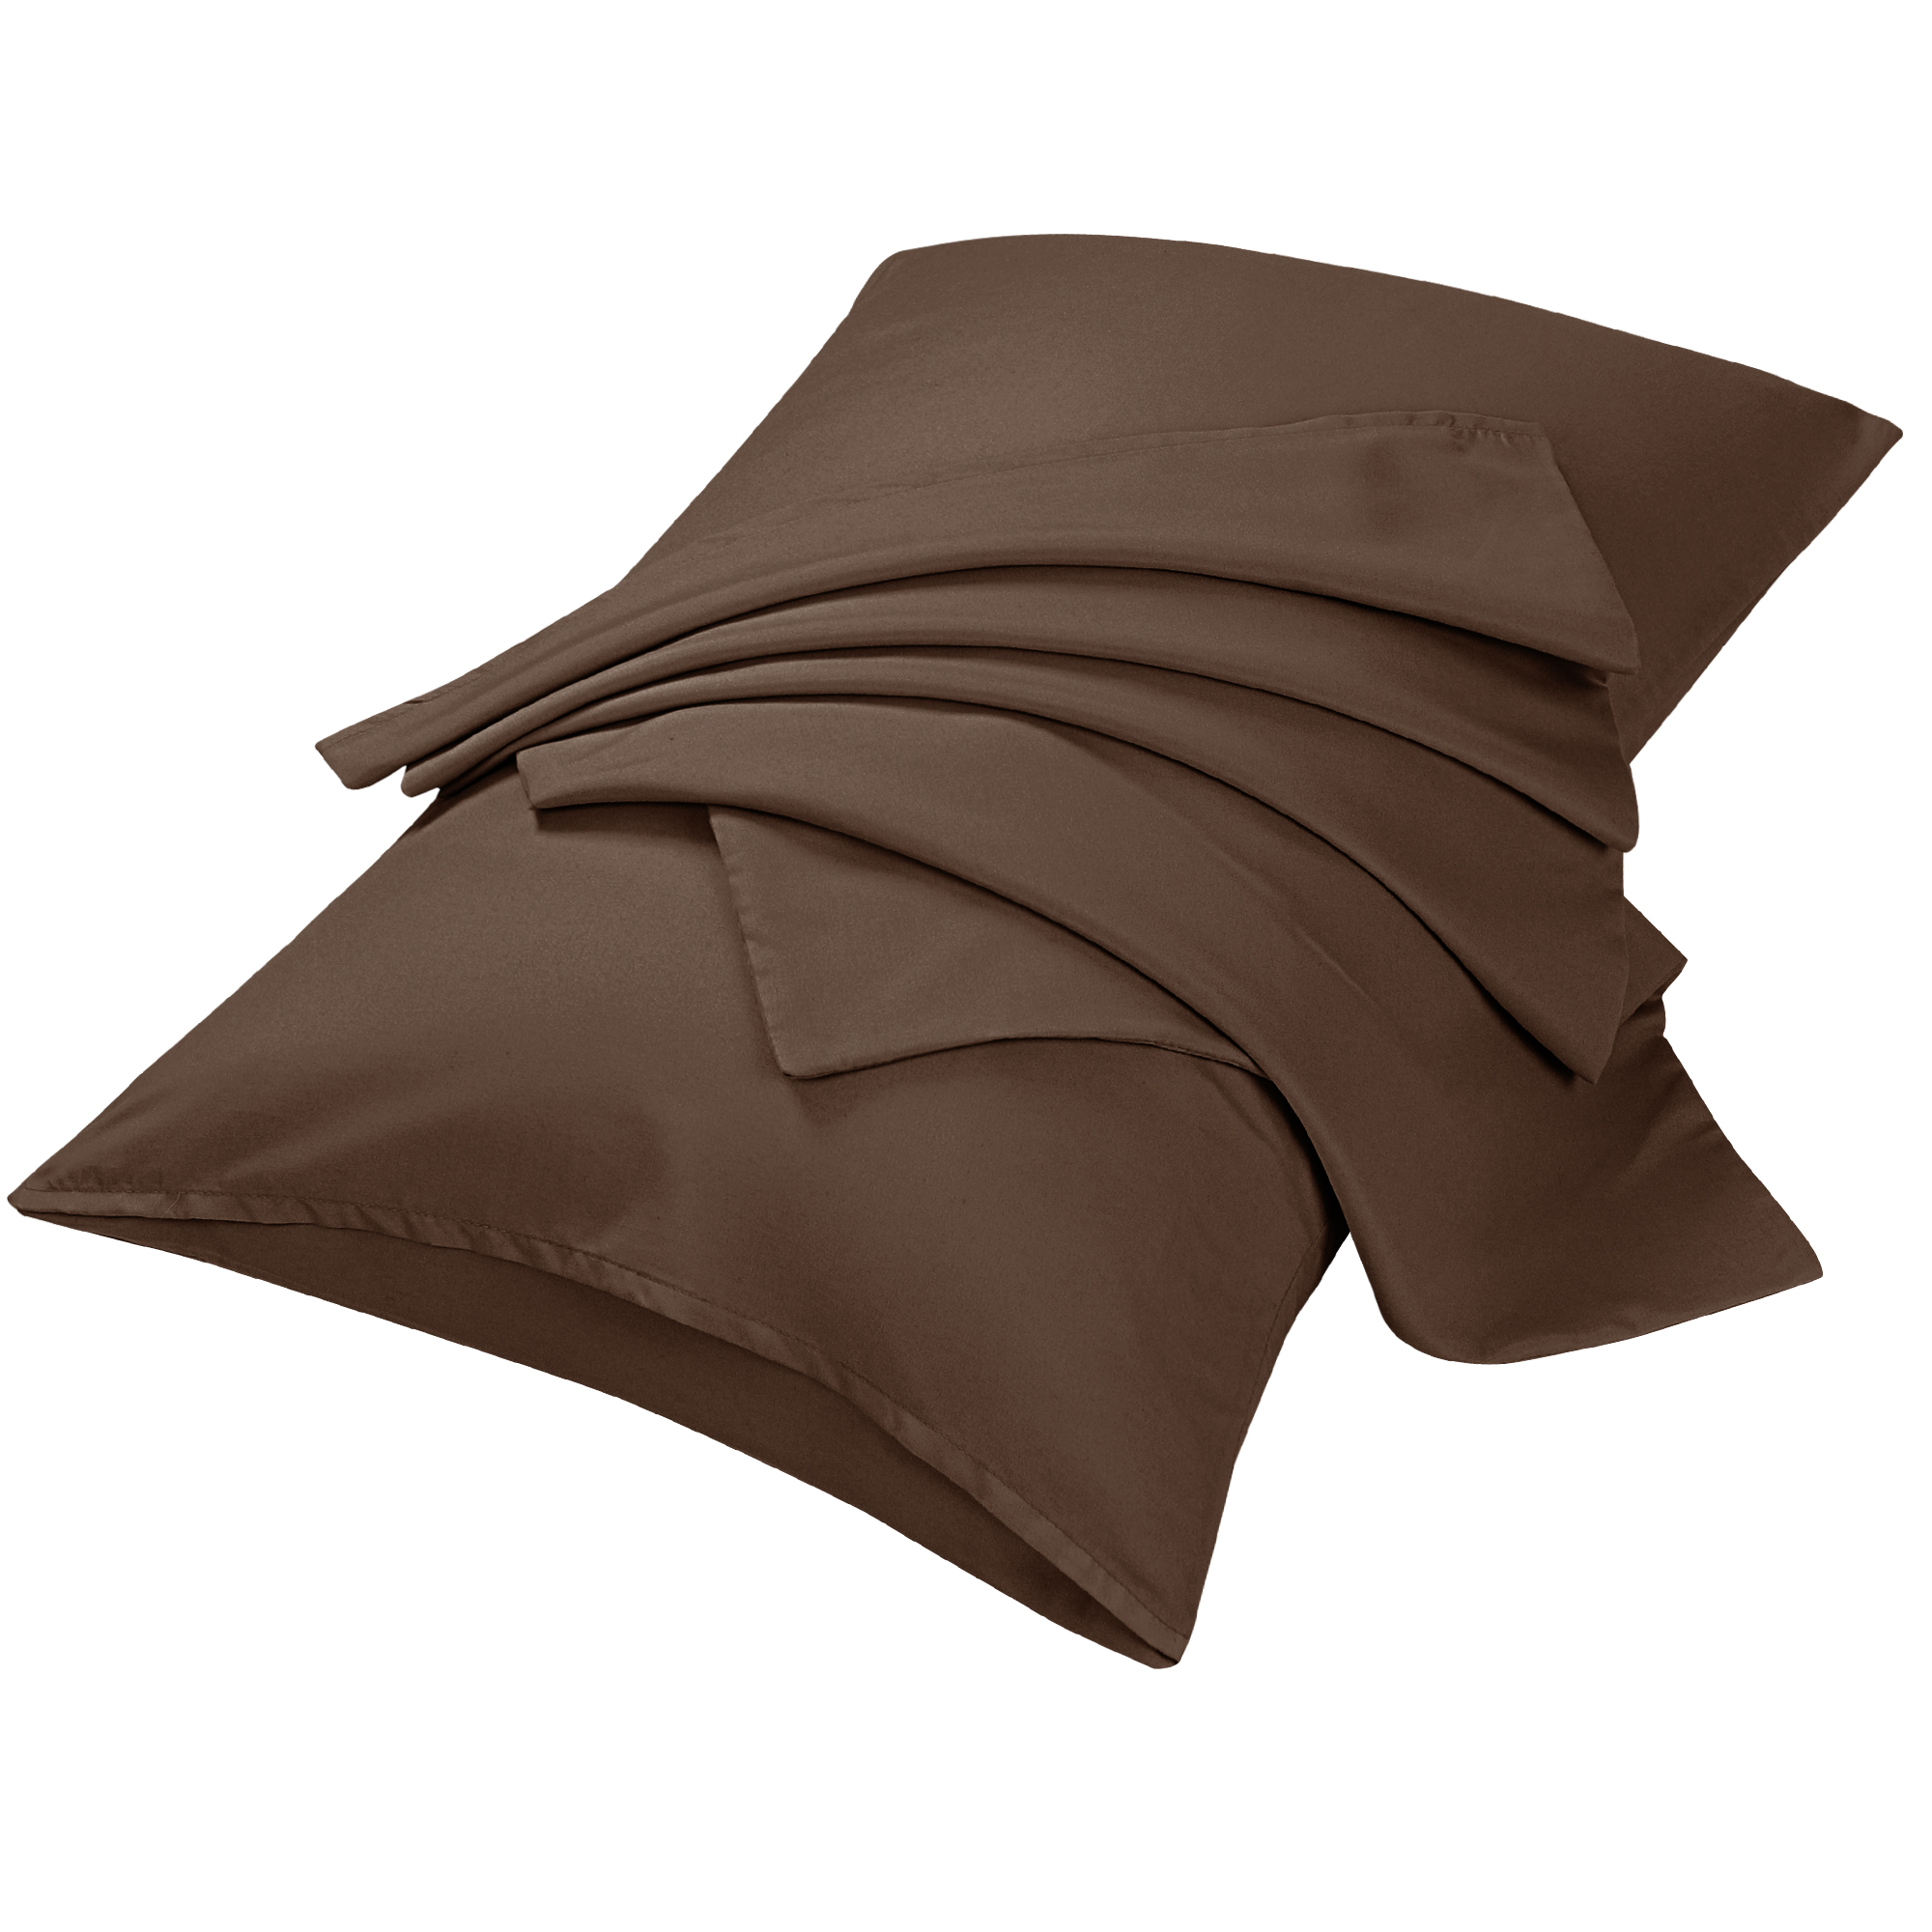 "2pcs Pillowcases Soft Microfiber, No Wrinkle, Coffee King (20"" x 36"")"